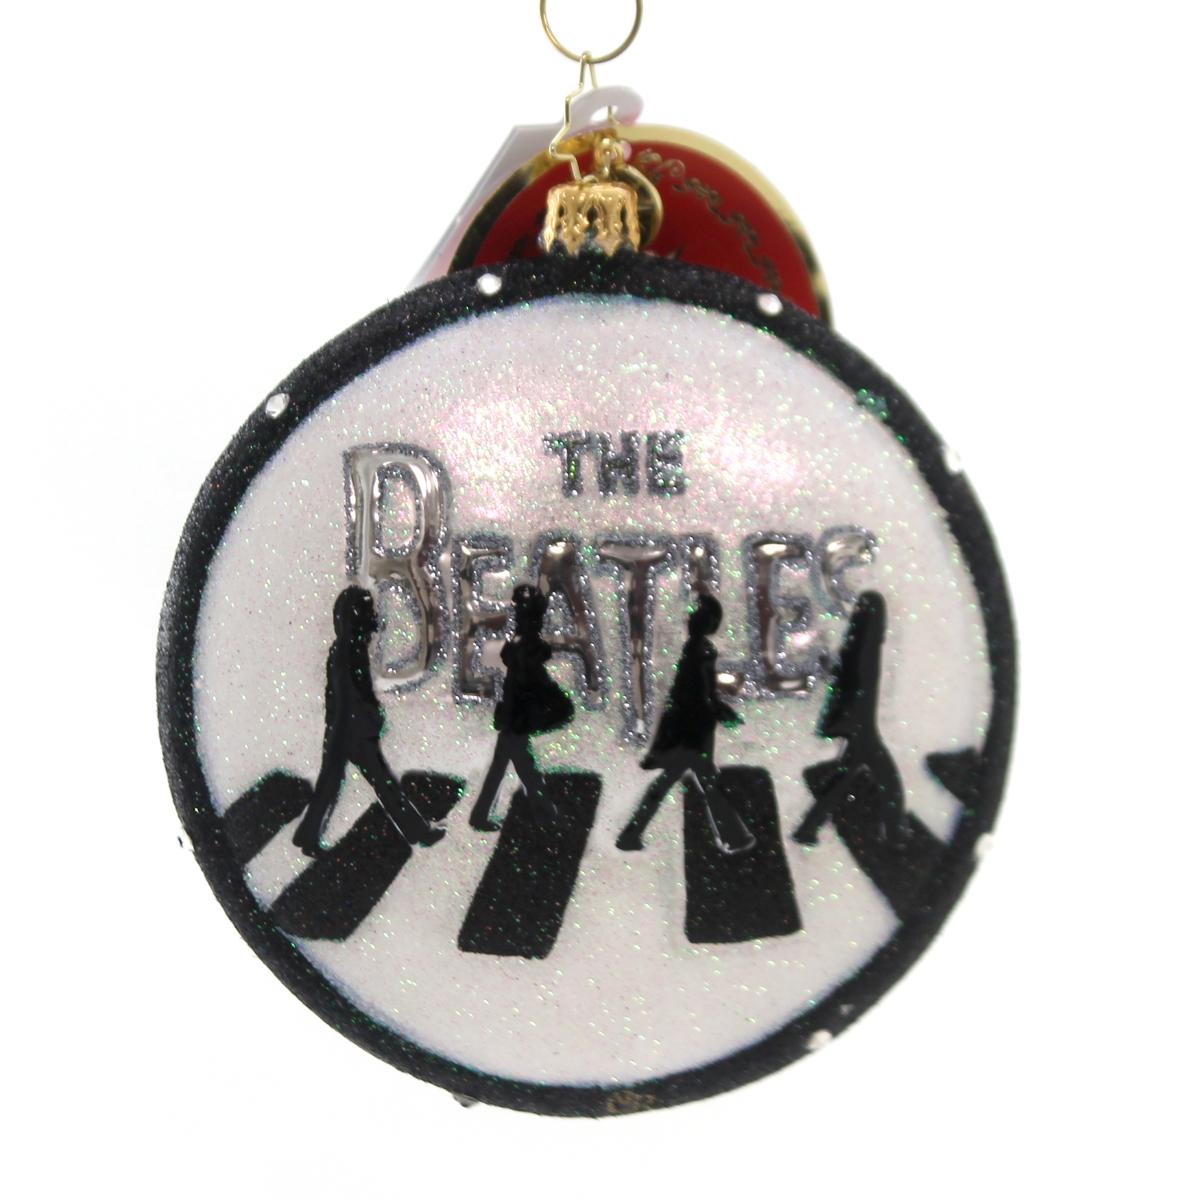 Abbey Road Christmas Ornament